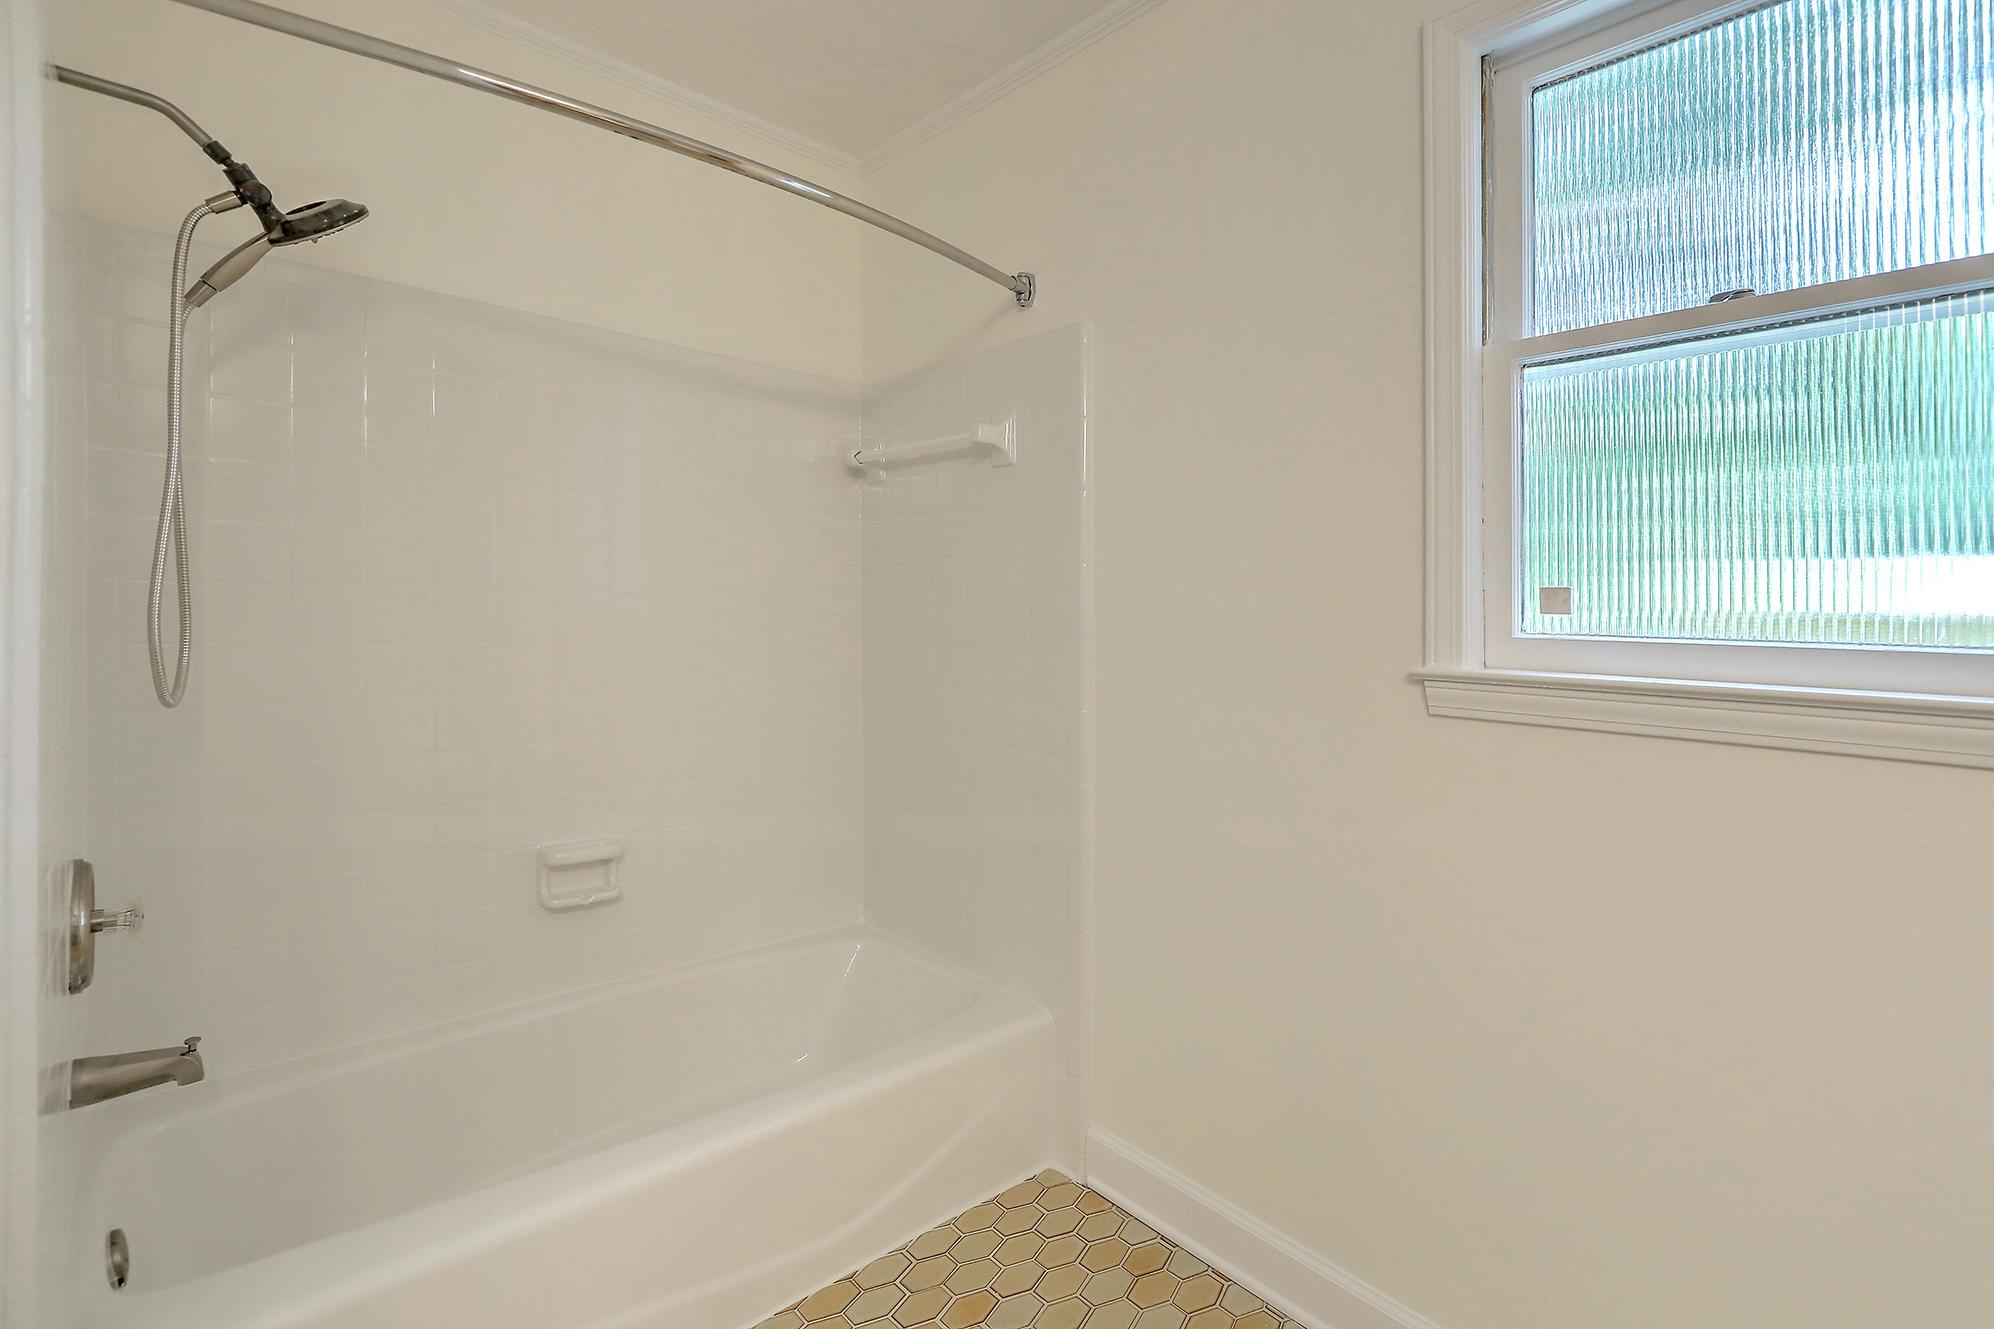 Edgewater Park Homes For Sale - 1413 Edsent, Charleston, SC - 25